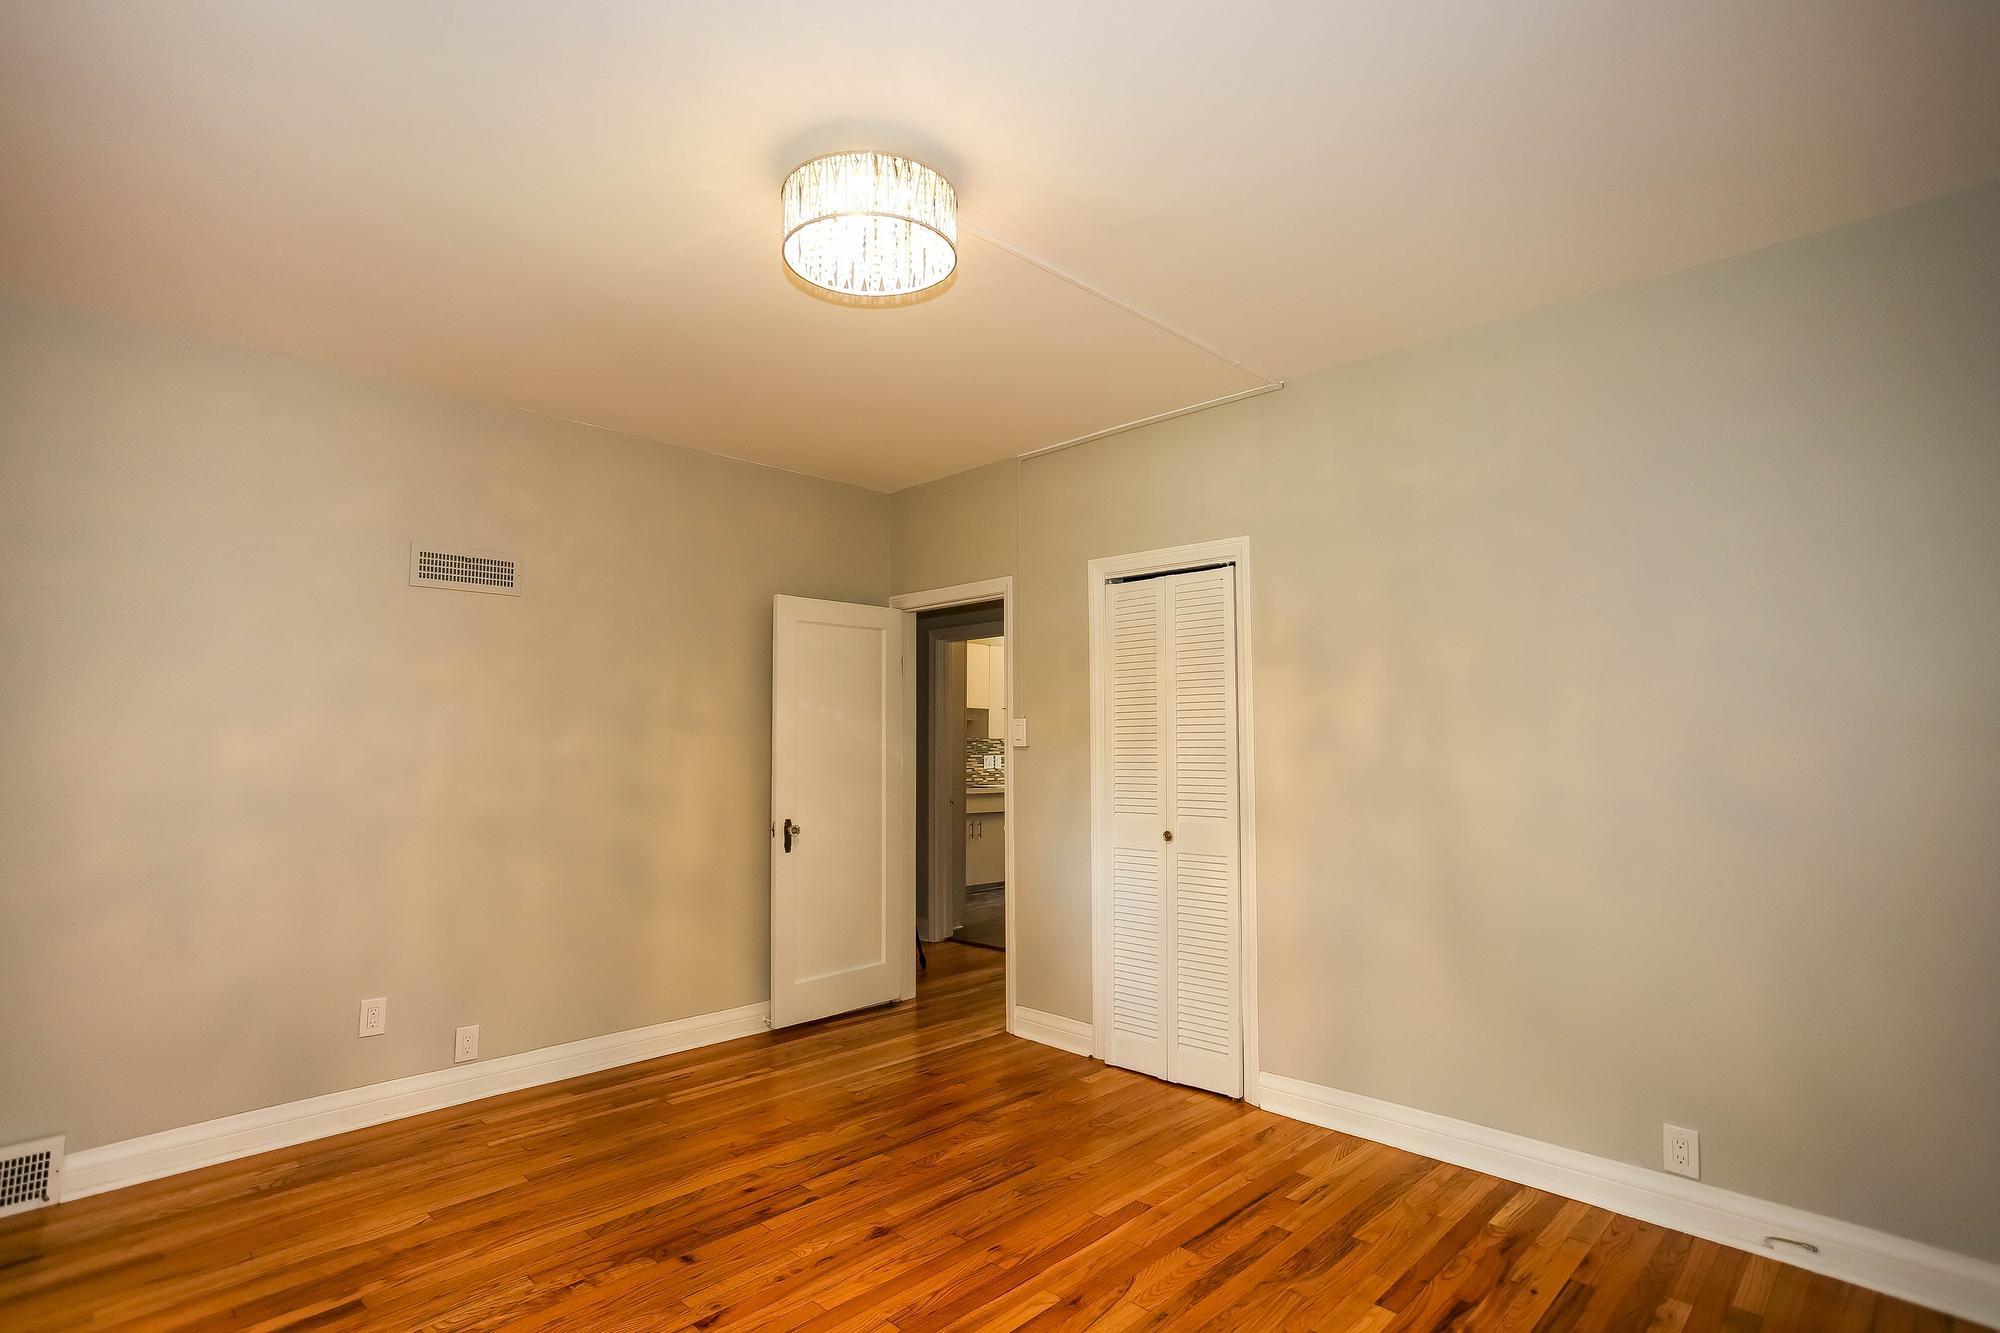 Photo 15: Photos: 155 Borebank Street in Winnipeg: River Heights Single Family Detached for sale (1C)  : MLS®# 202017166